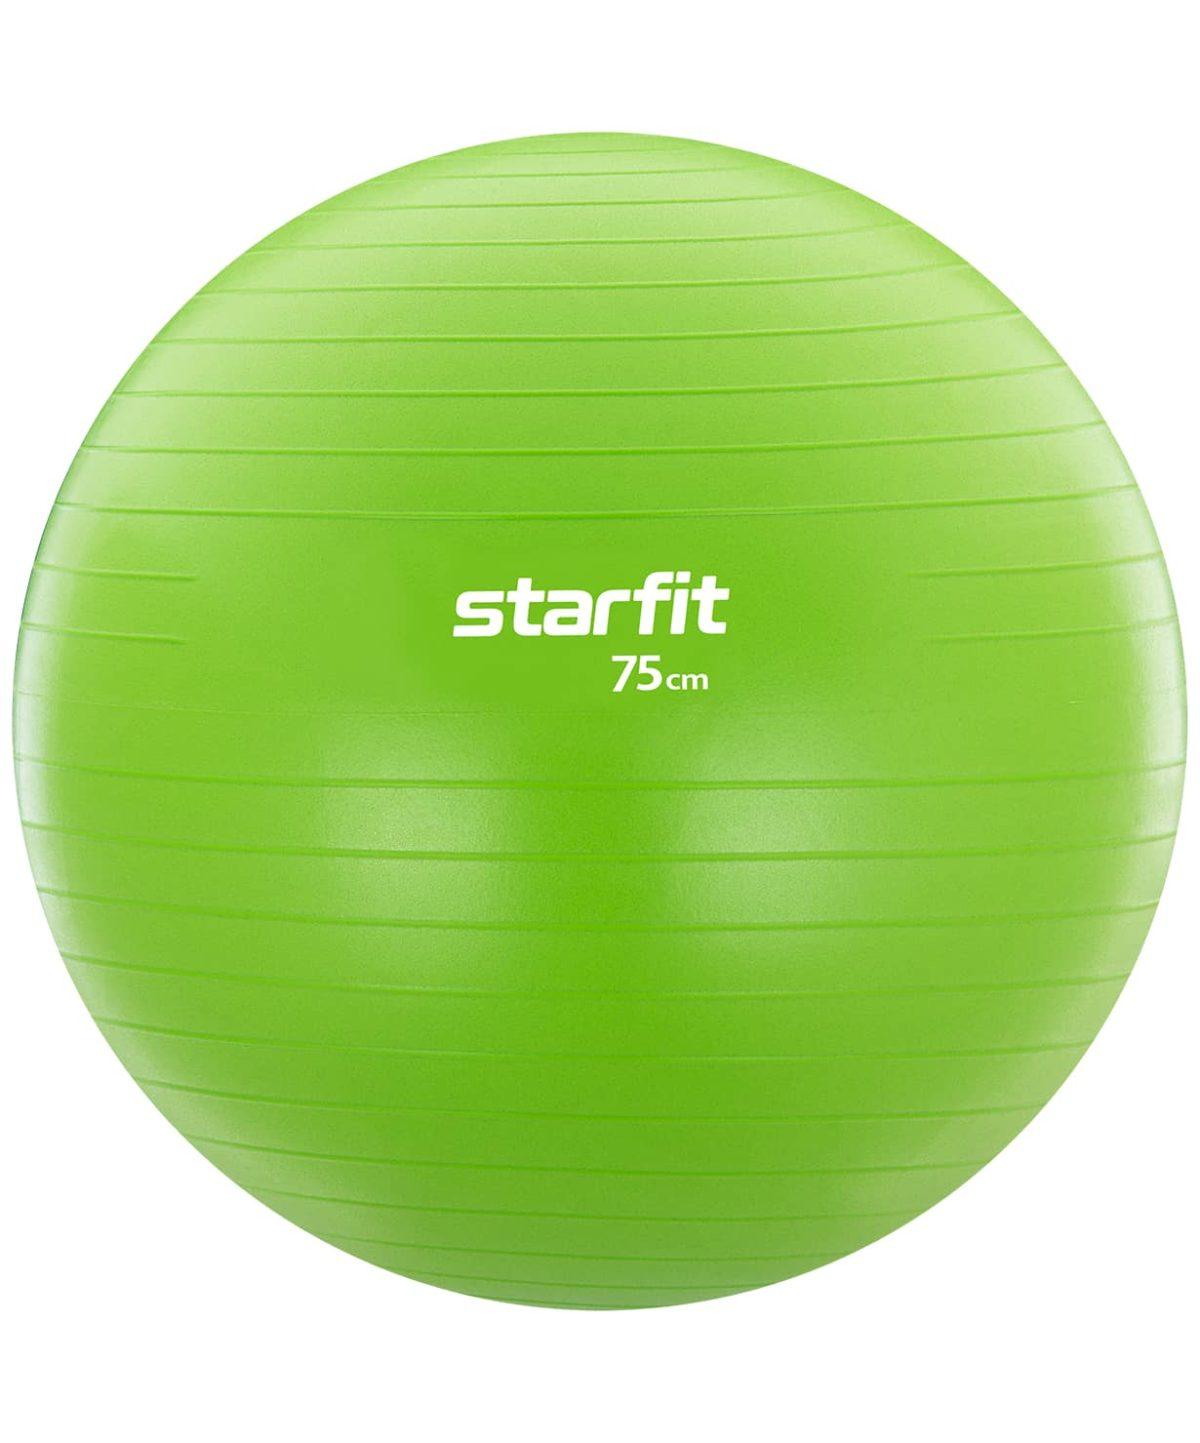 STARFIT Фитбол антивзрыв 75 см 1200 гр, без насоса GB-104: зелёный - 1